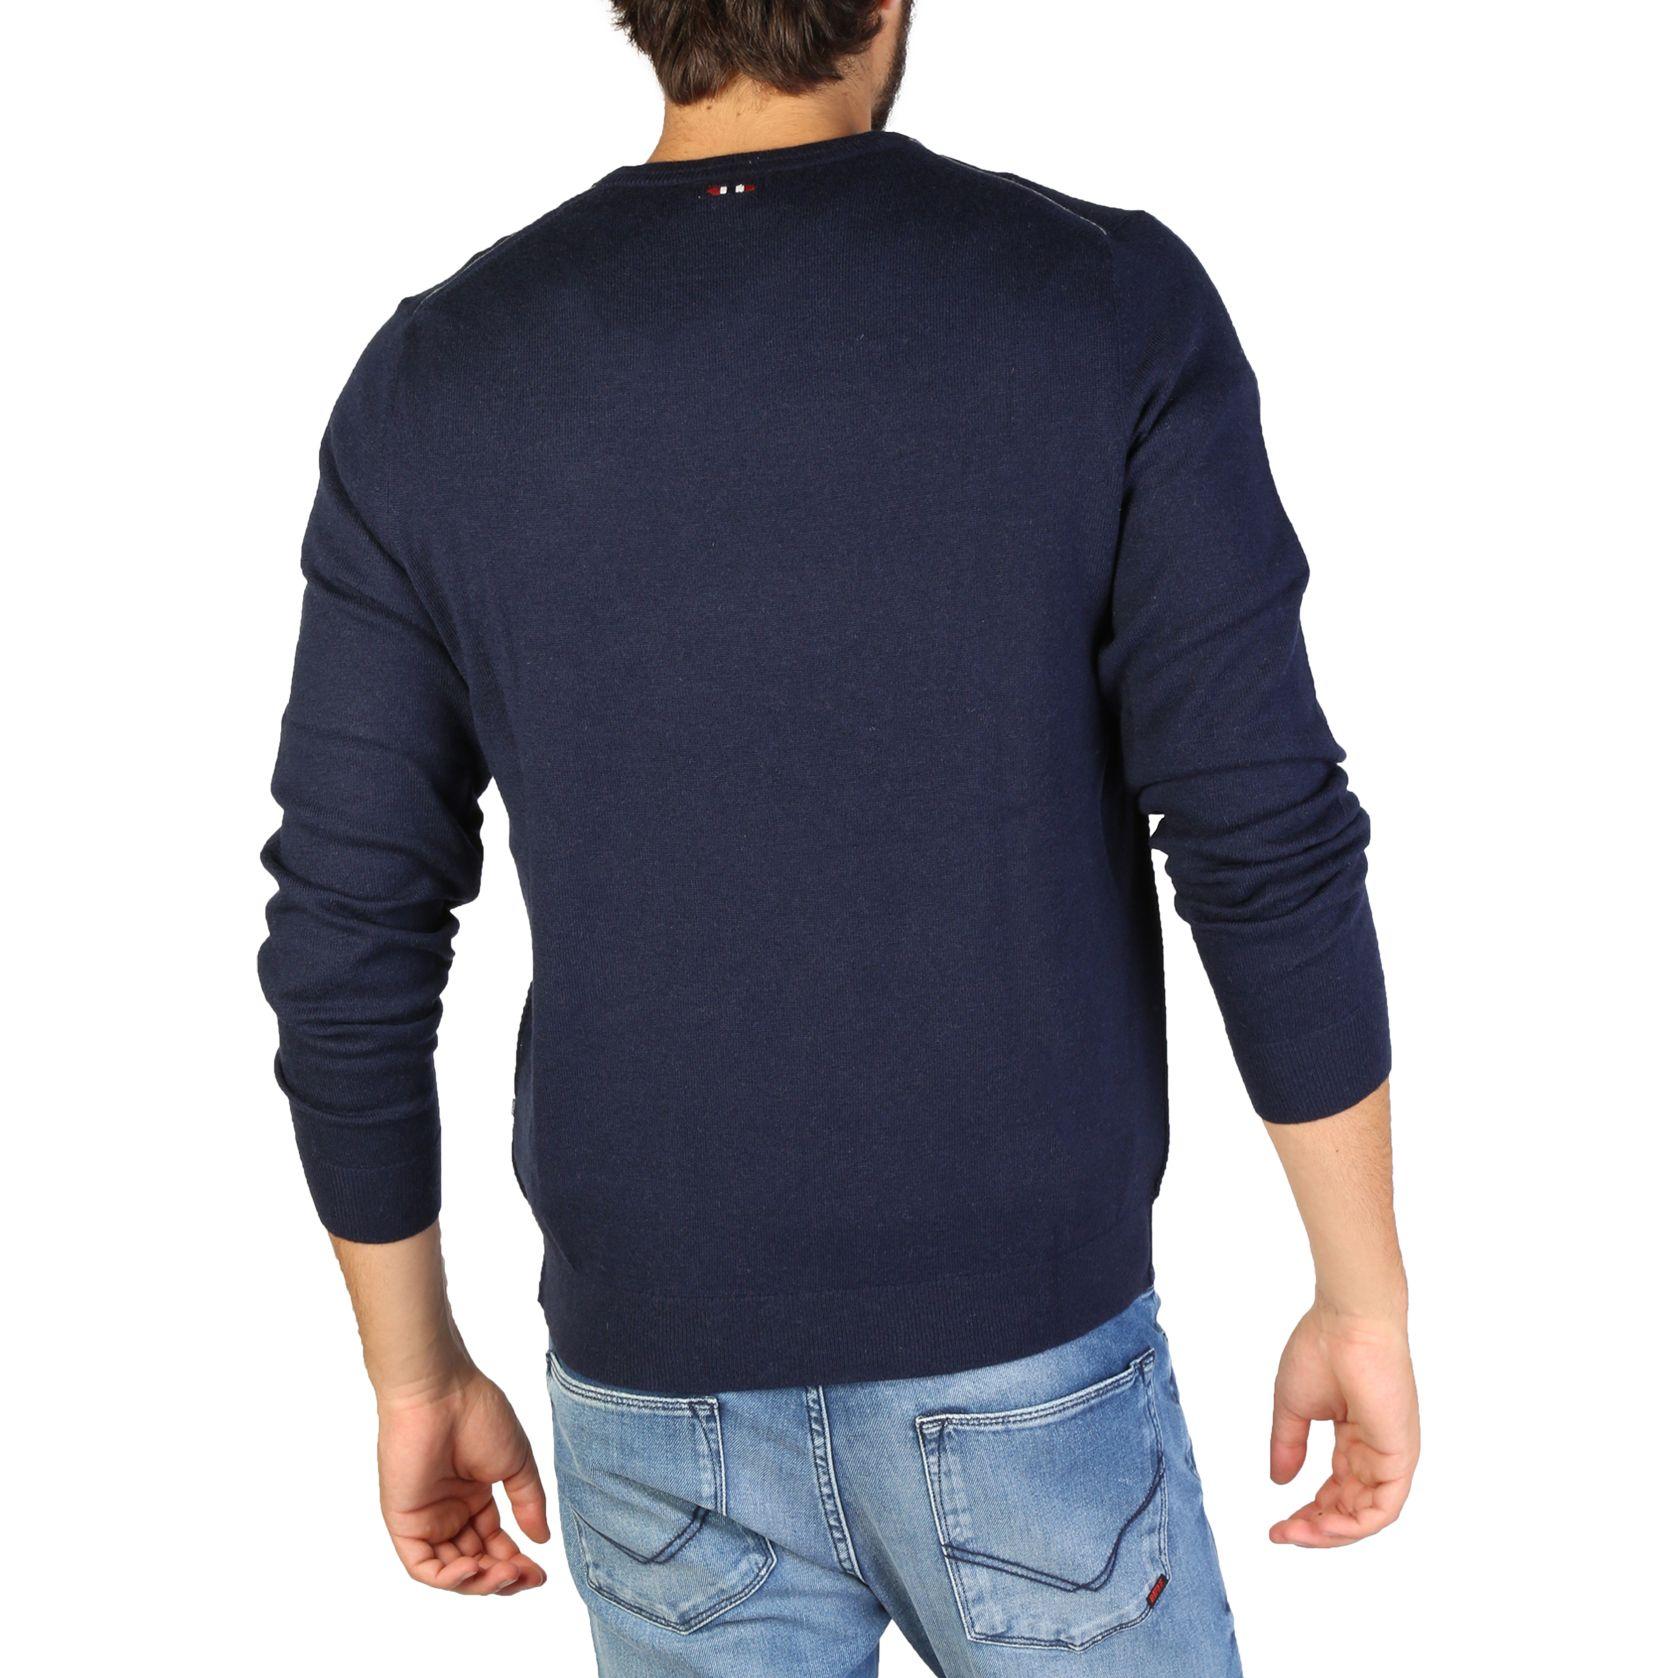 Napapijri Mens Sweaters